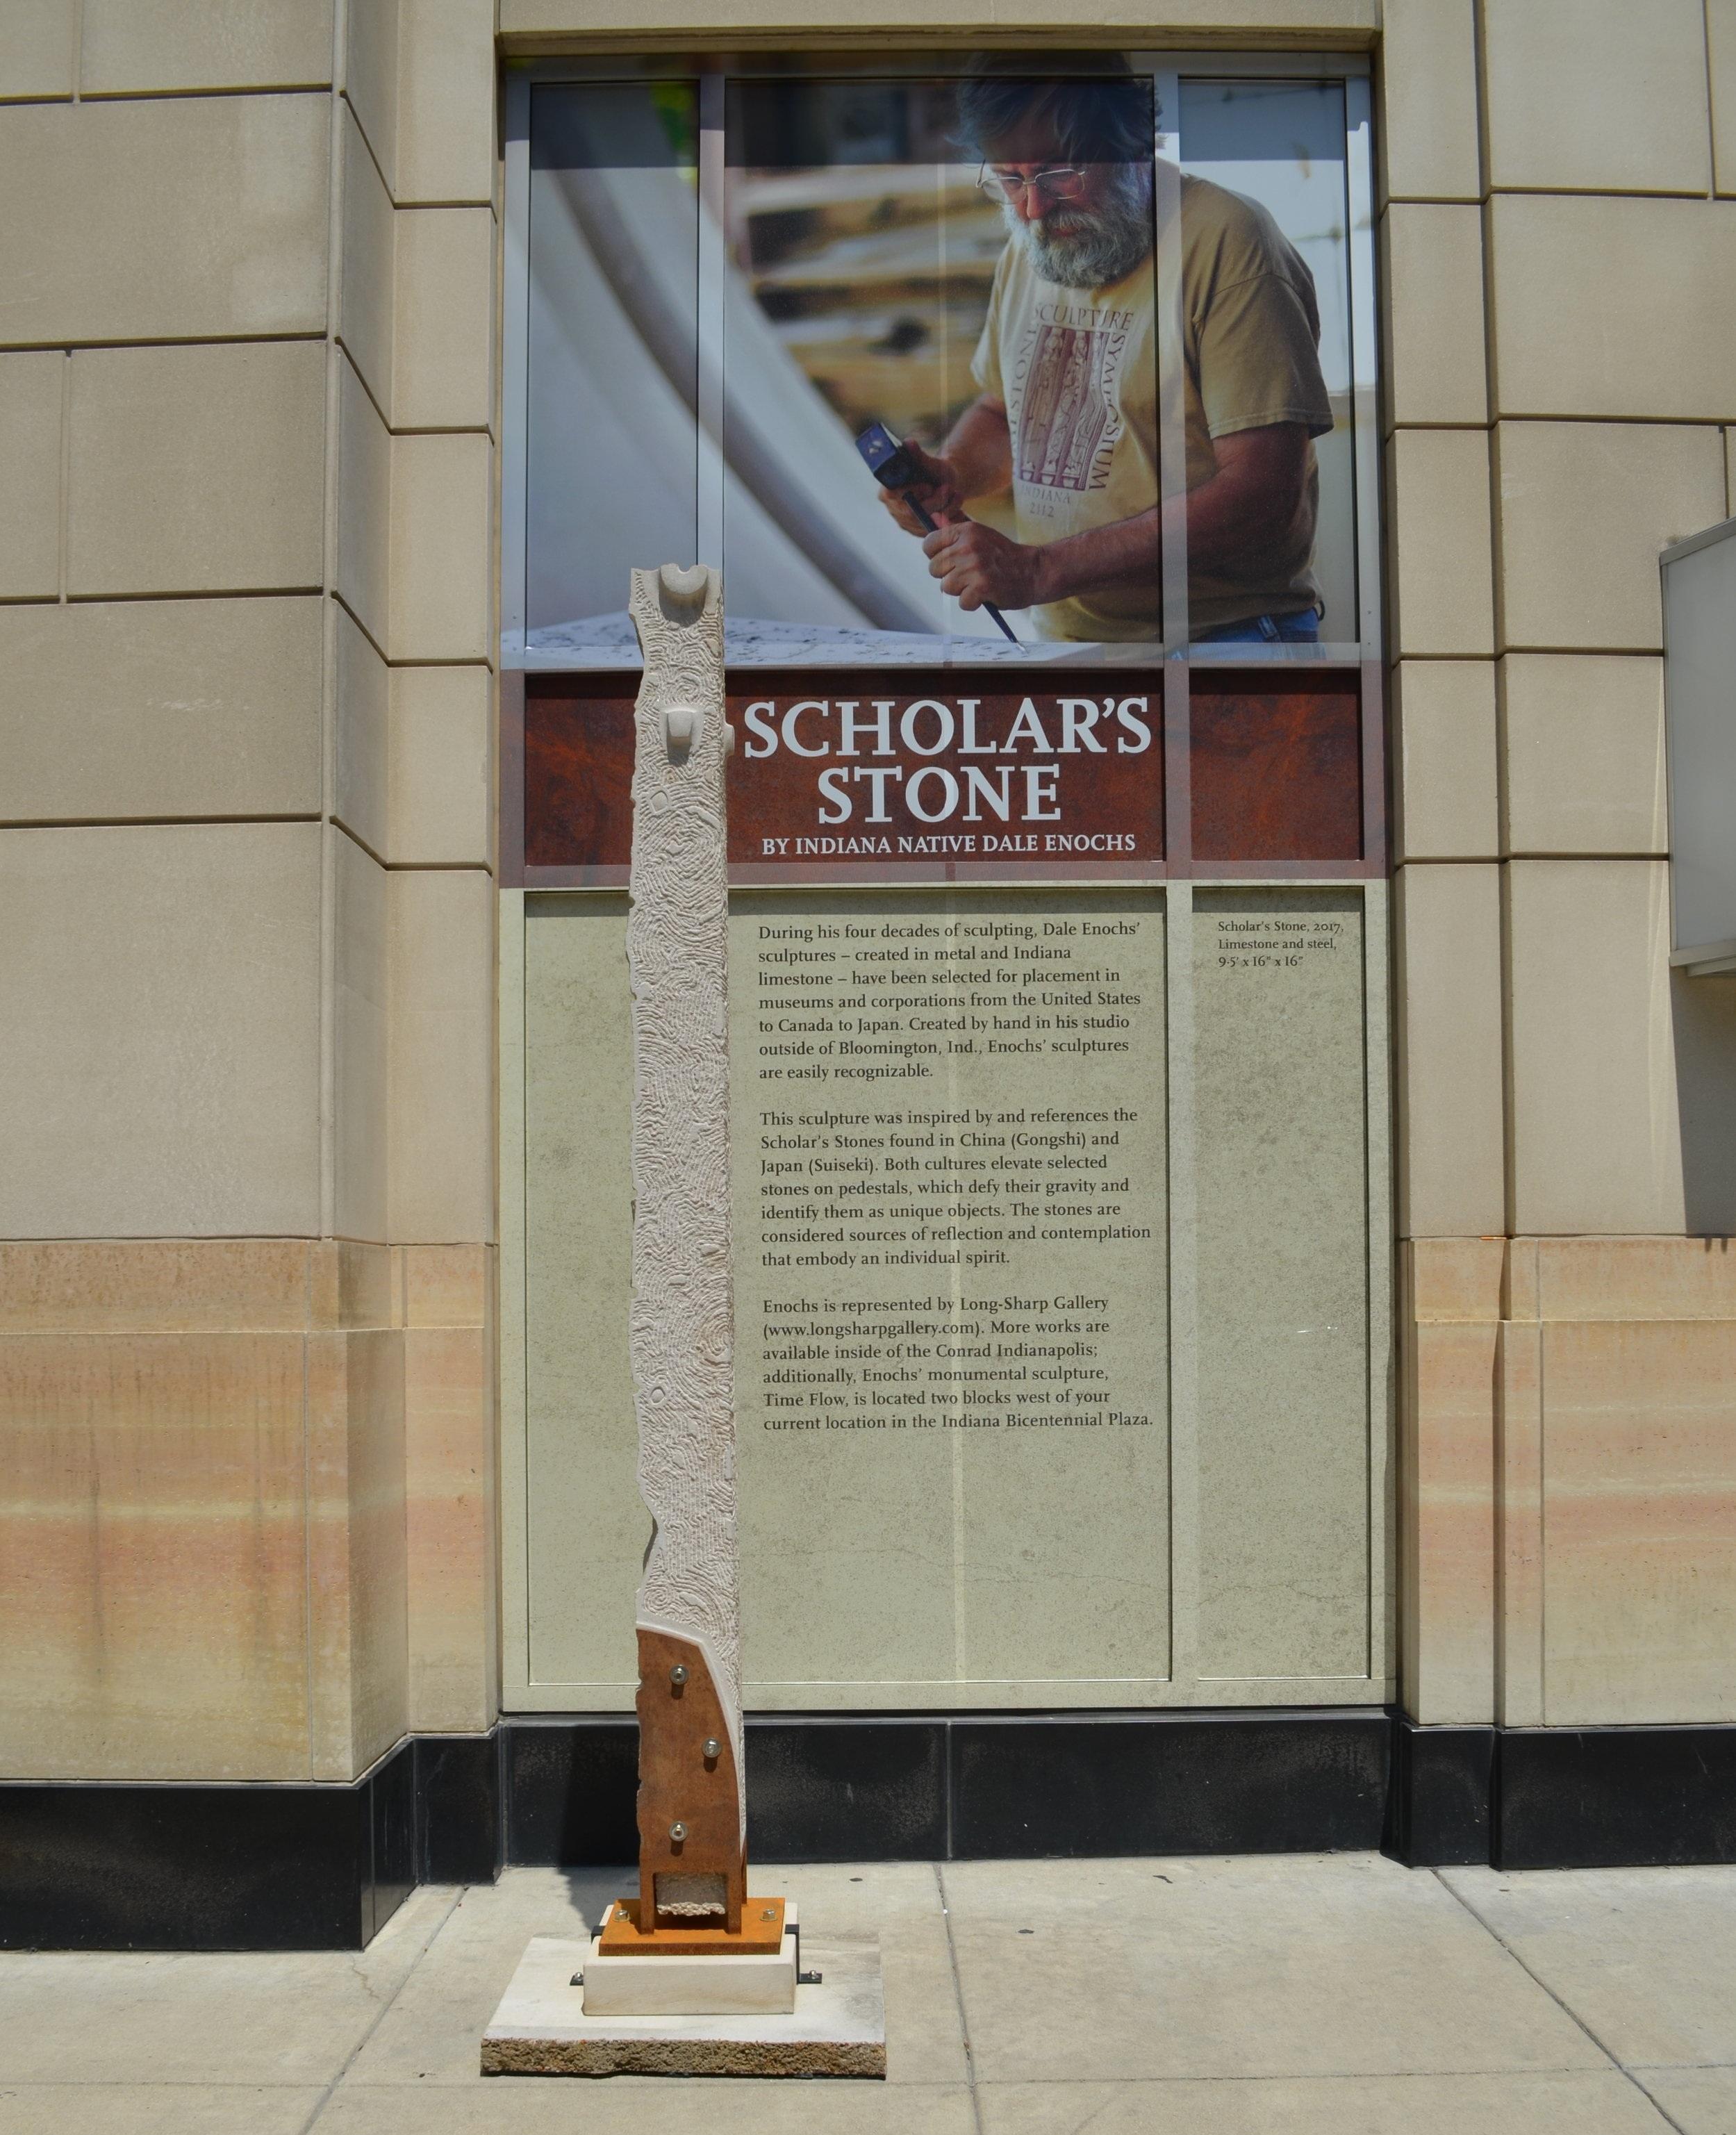 install shot of dale enochs' scholar stone at conrad indianapolis